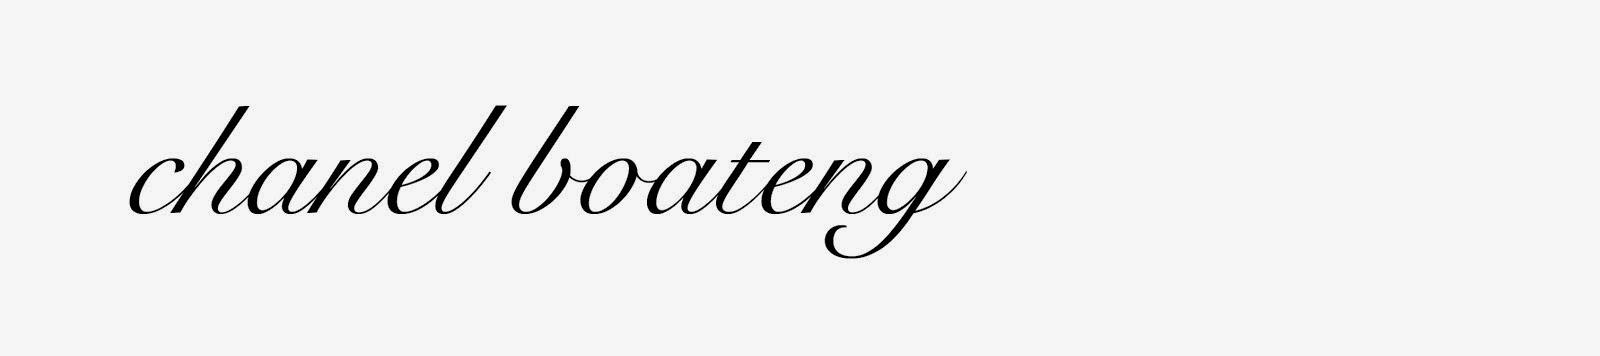 Chanel Boateng